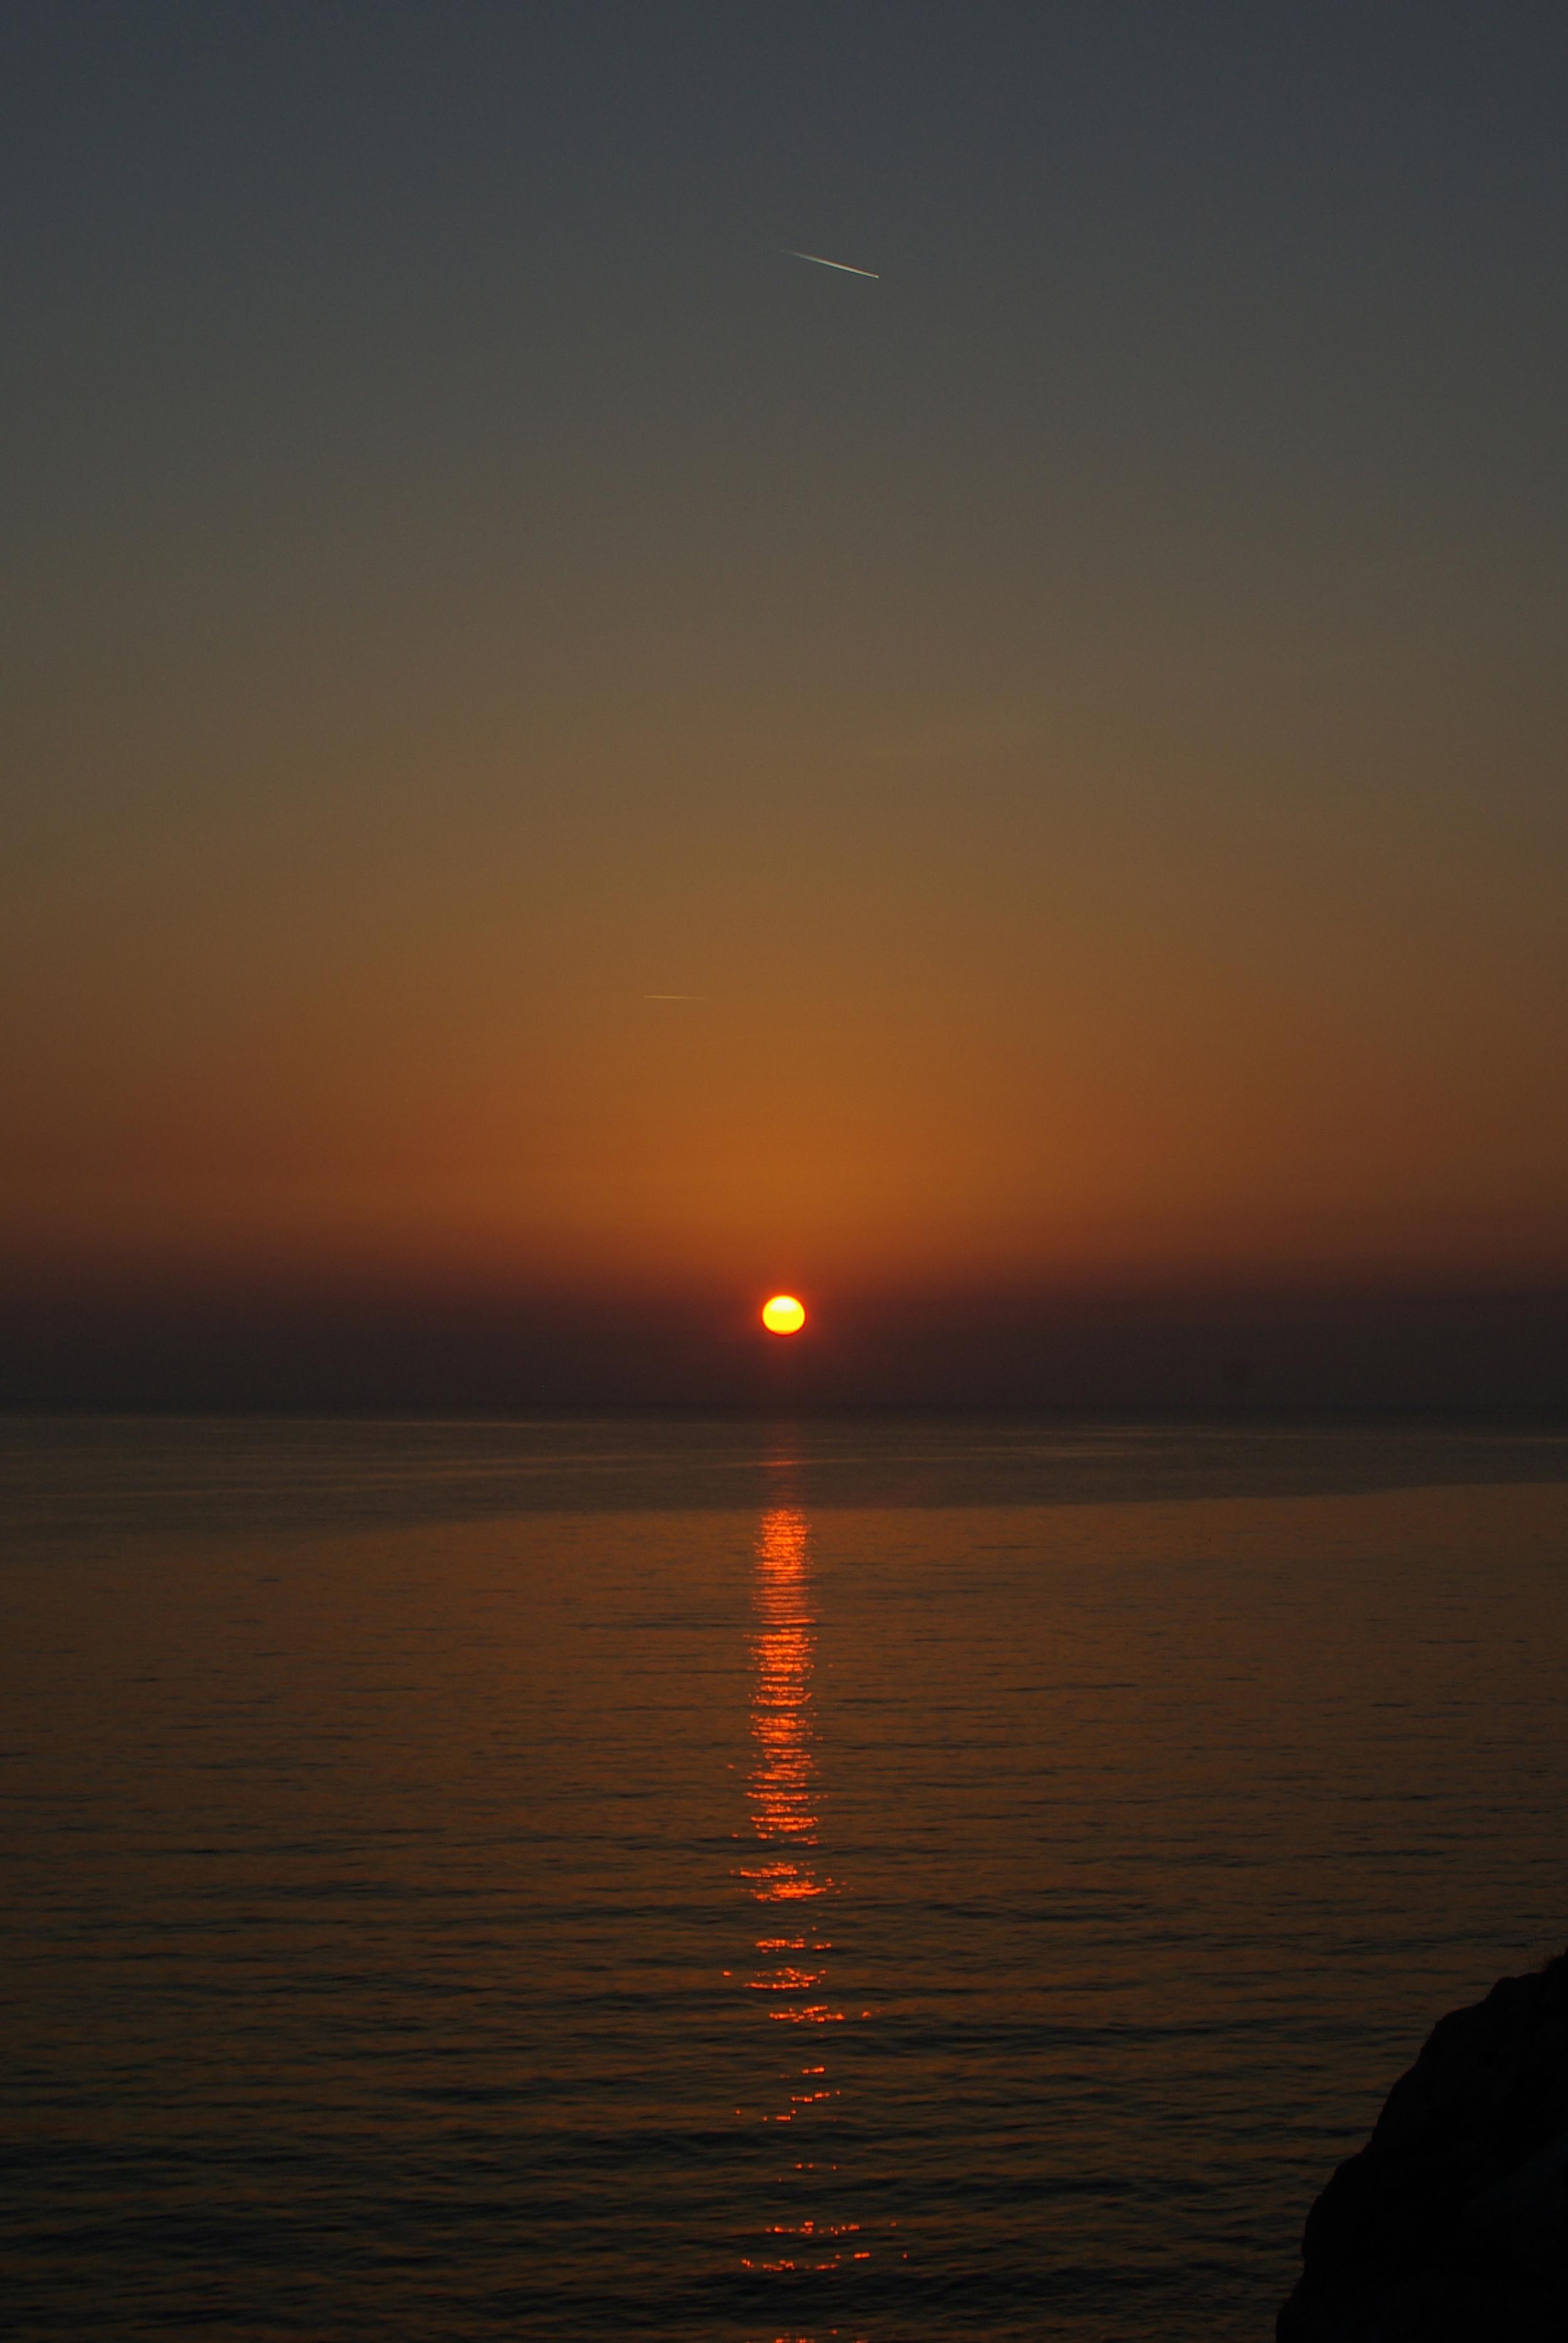 Plane Over Sunset